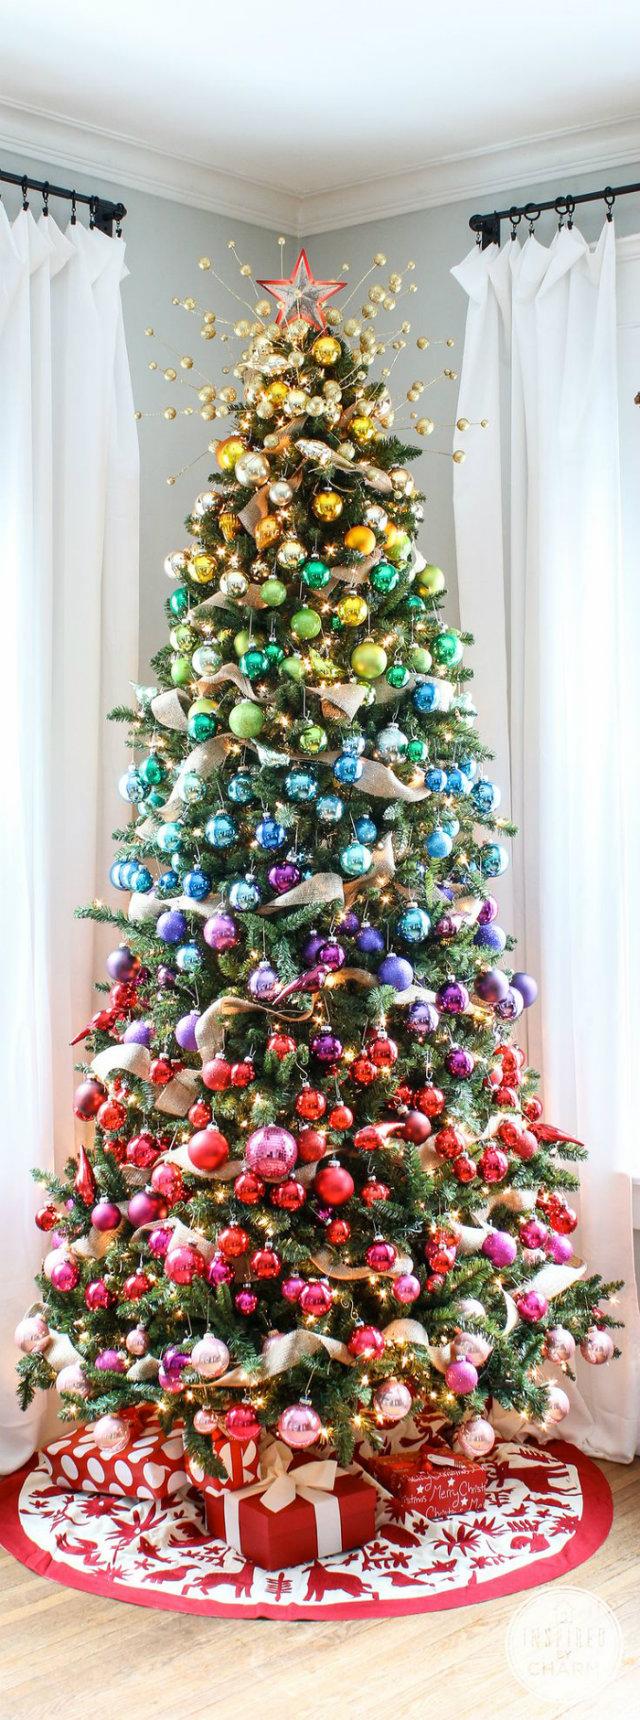 UNIQUE CHRISTMAS TREES 4 christmas tree ideas Best 24 DIY Christmas Tree Ideas UNIQUE CHRISTMAS TREES 4